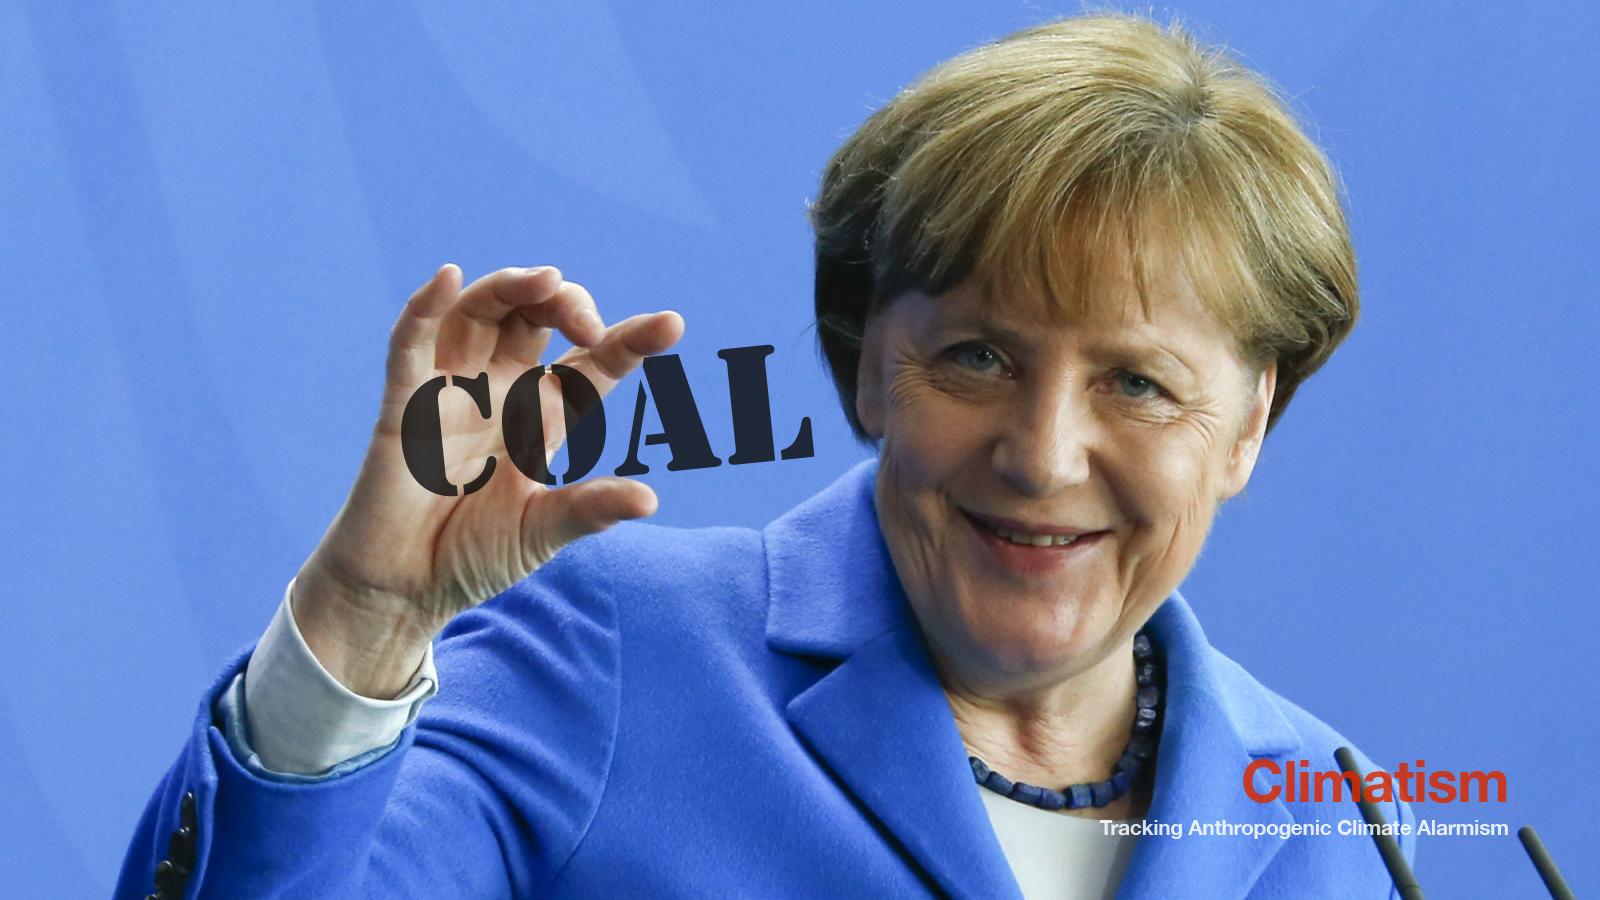 ANGELA MERKEL - The New Climate Change 'Denier'